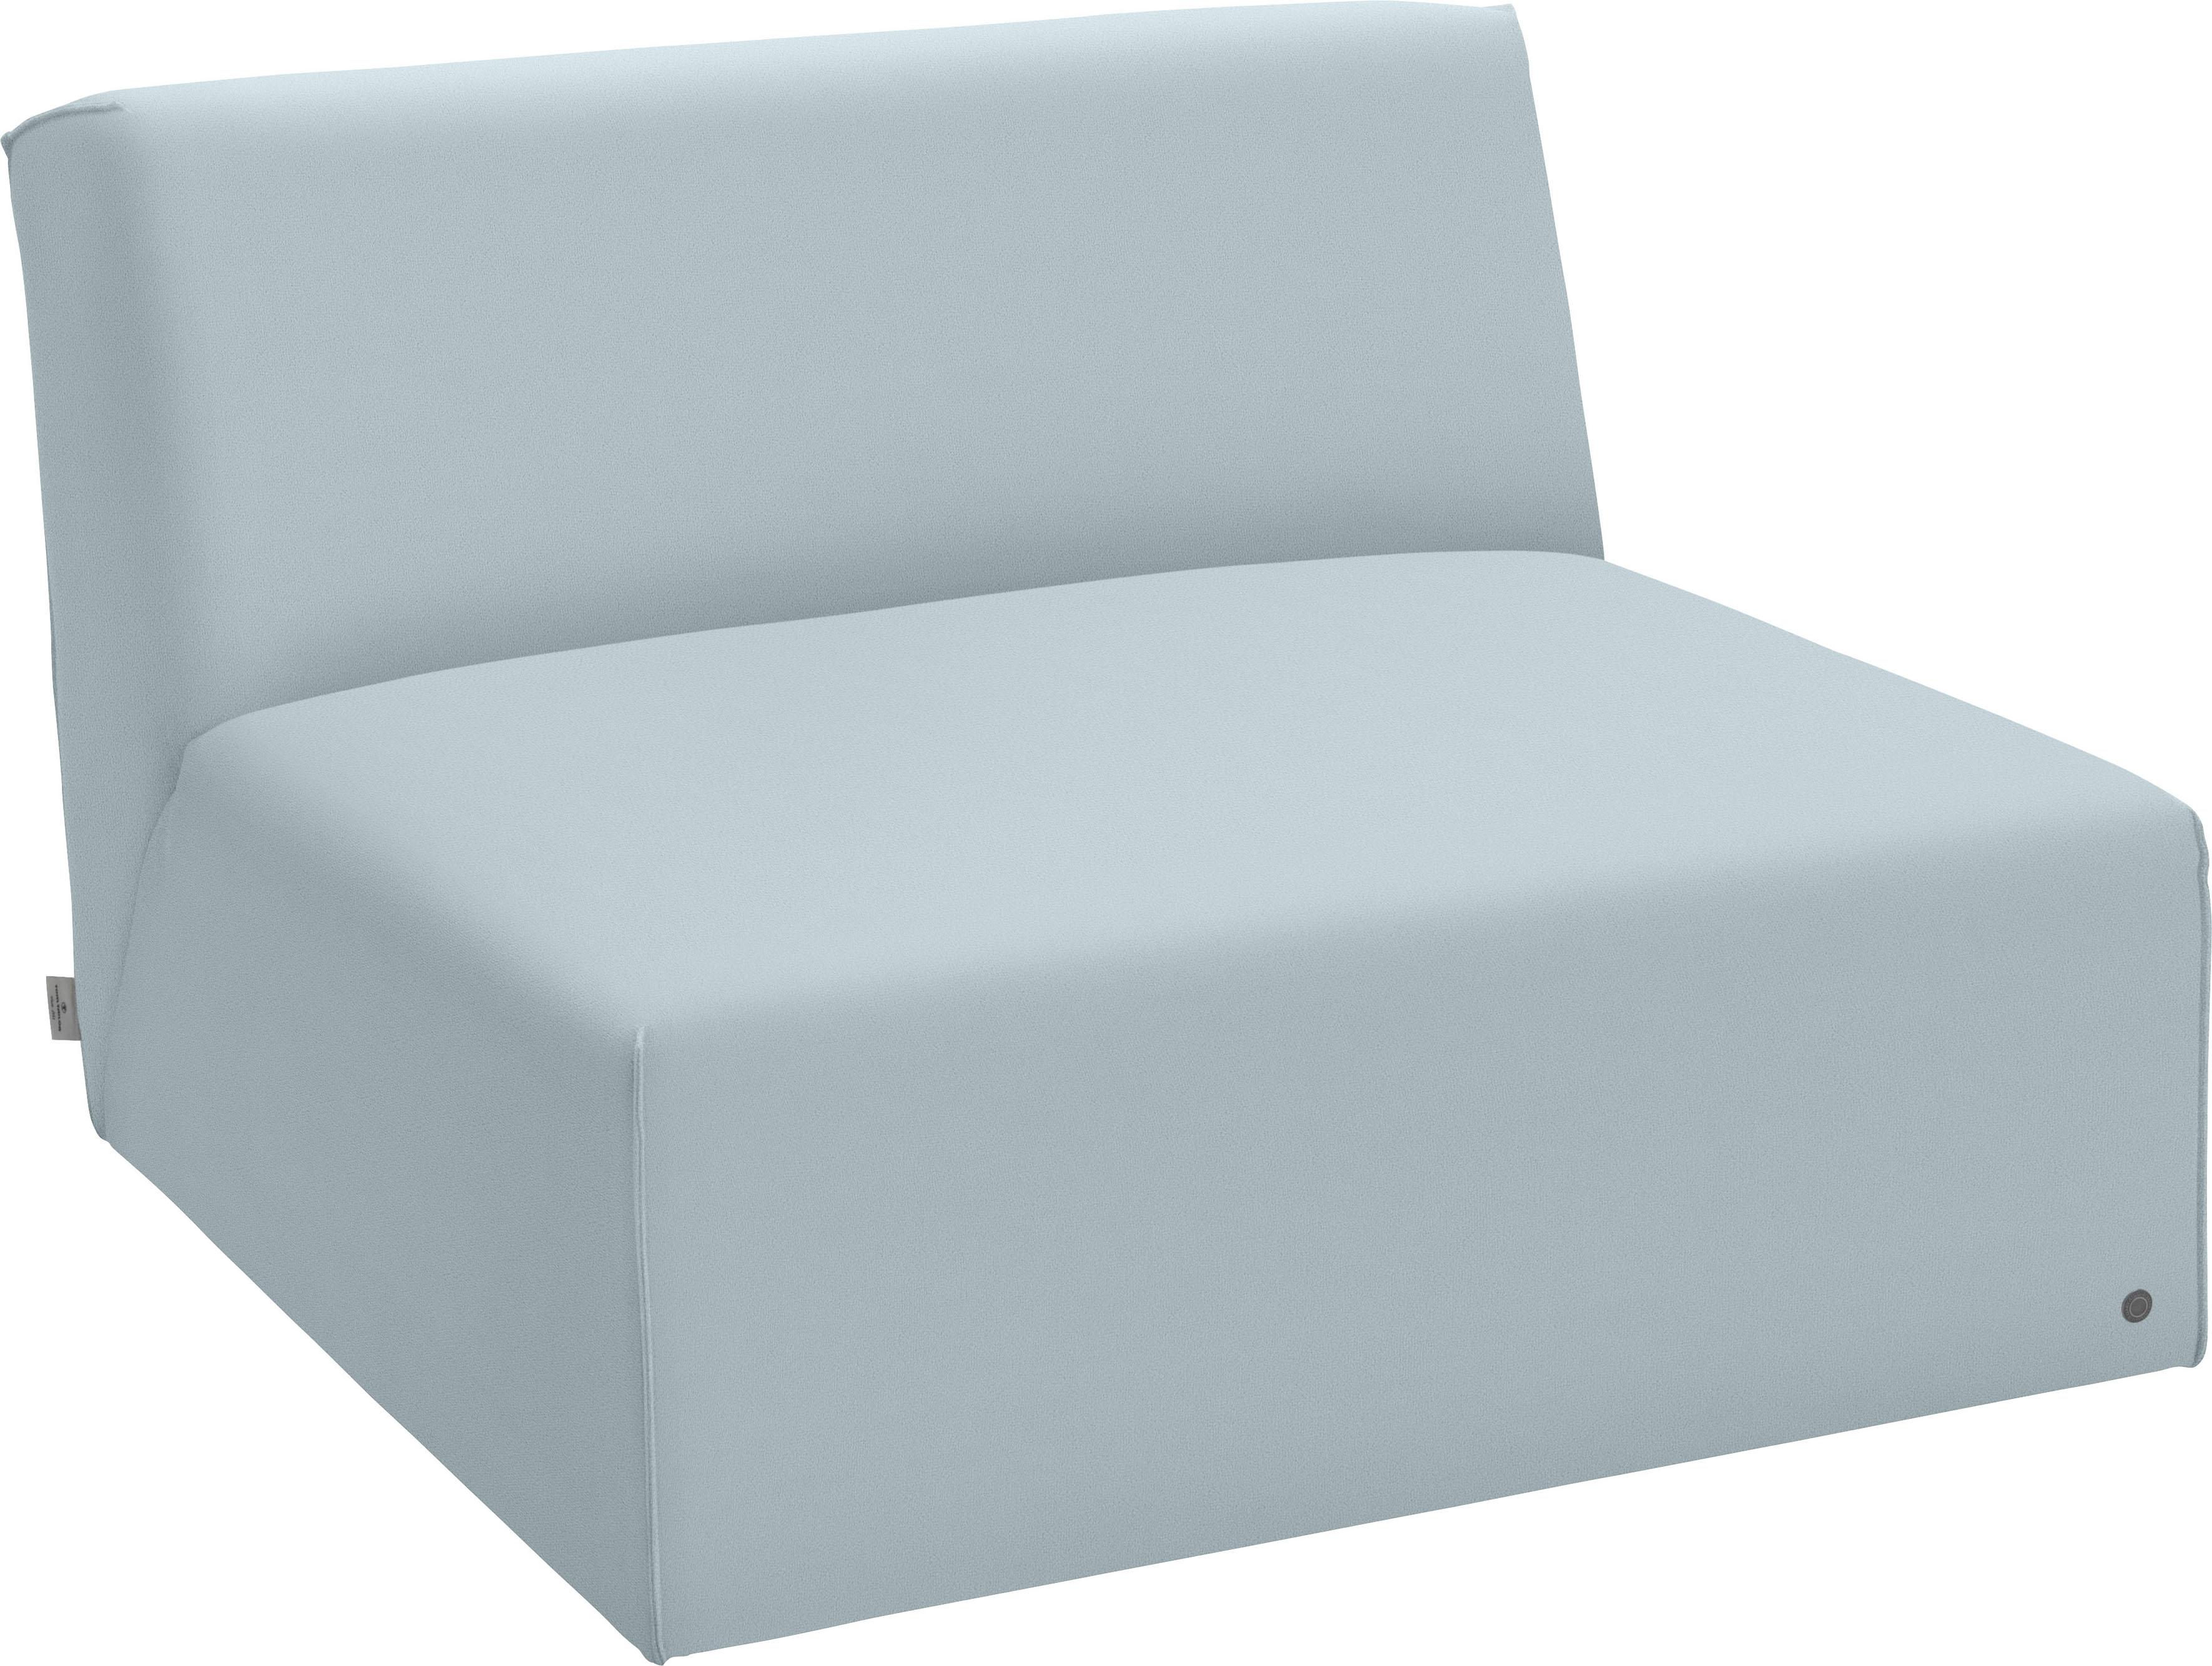 TOM TAILOR Sofaelement ELEMENTS, Sitzelement ohne Armlehne blau Sofaelemente Sofas Couches